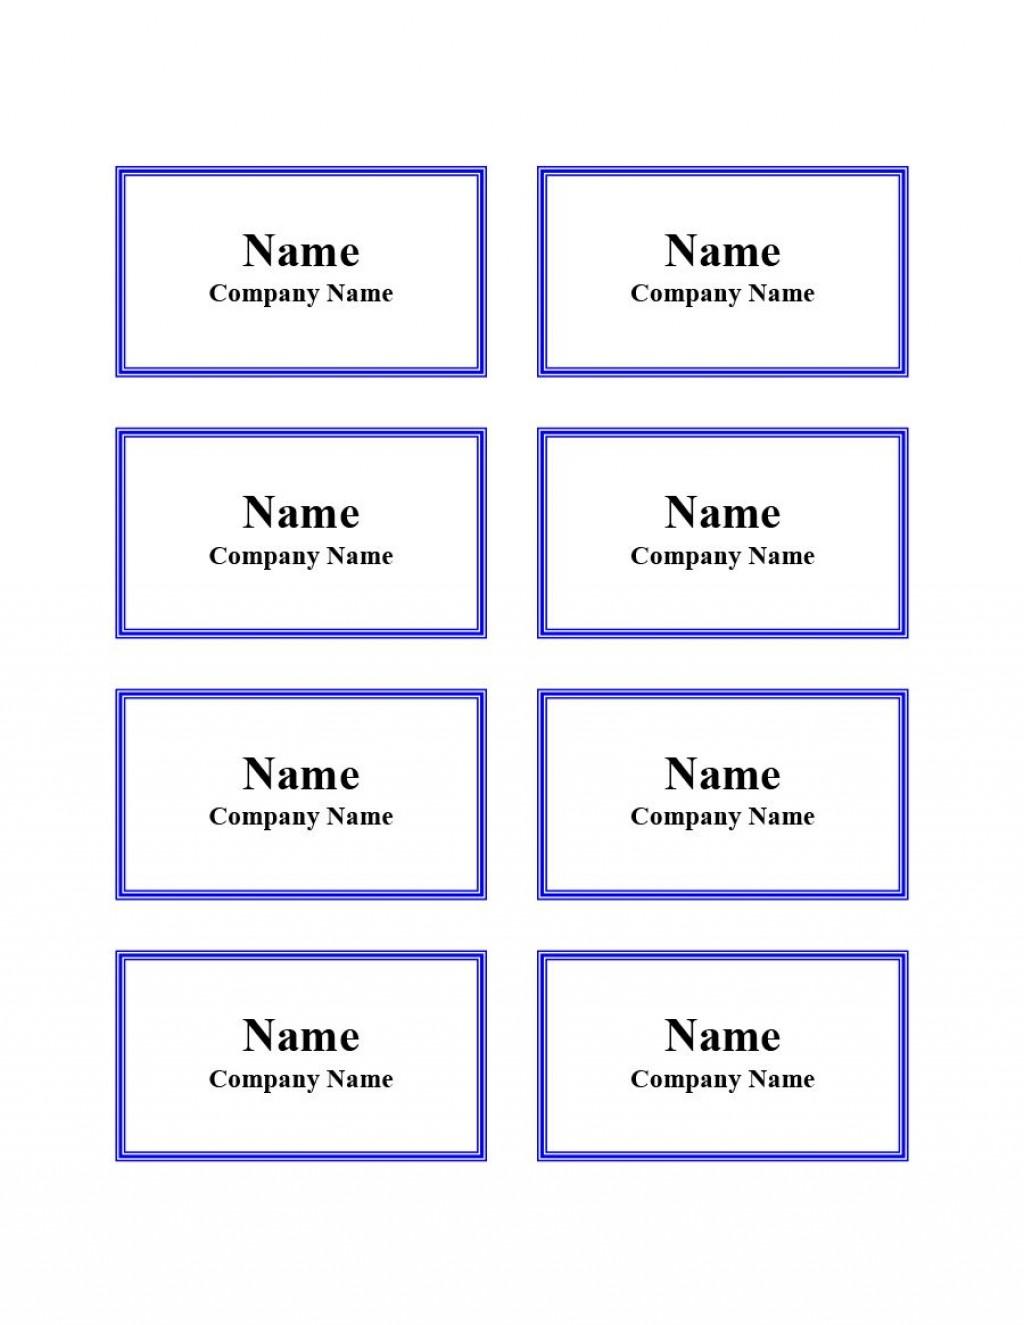 011 Striking Name Badge Template Word Sample  Free Download 2010 Avery 5392Large